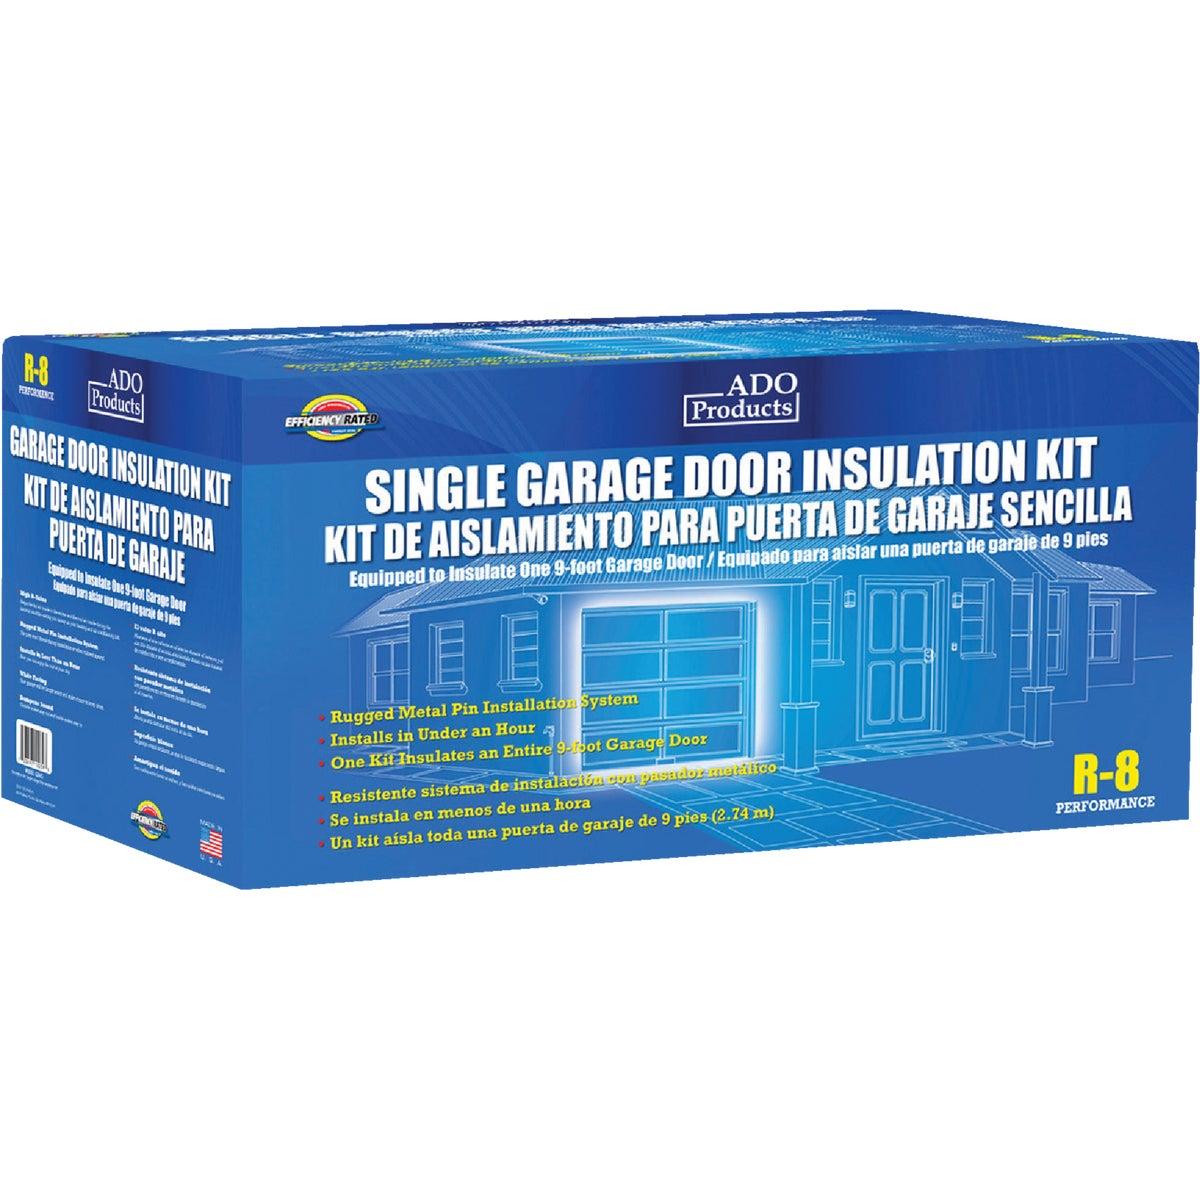 ADO 7 Ft. Or 8 Ft. Single Garage Door Insulation Kit, GDIKS